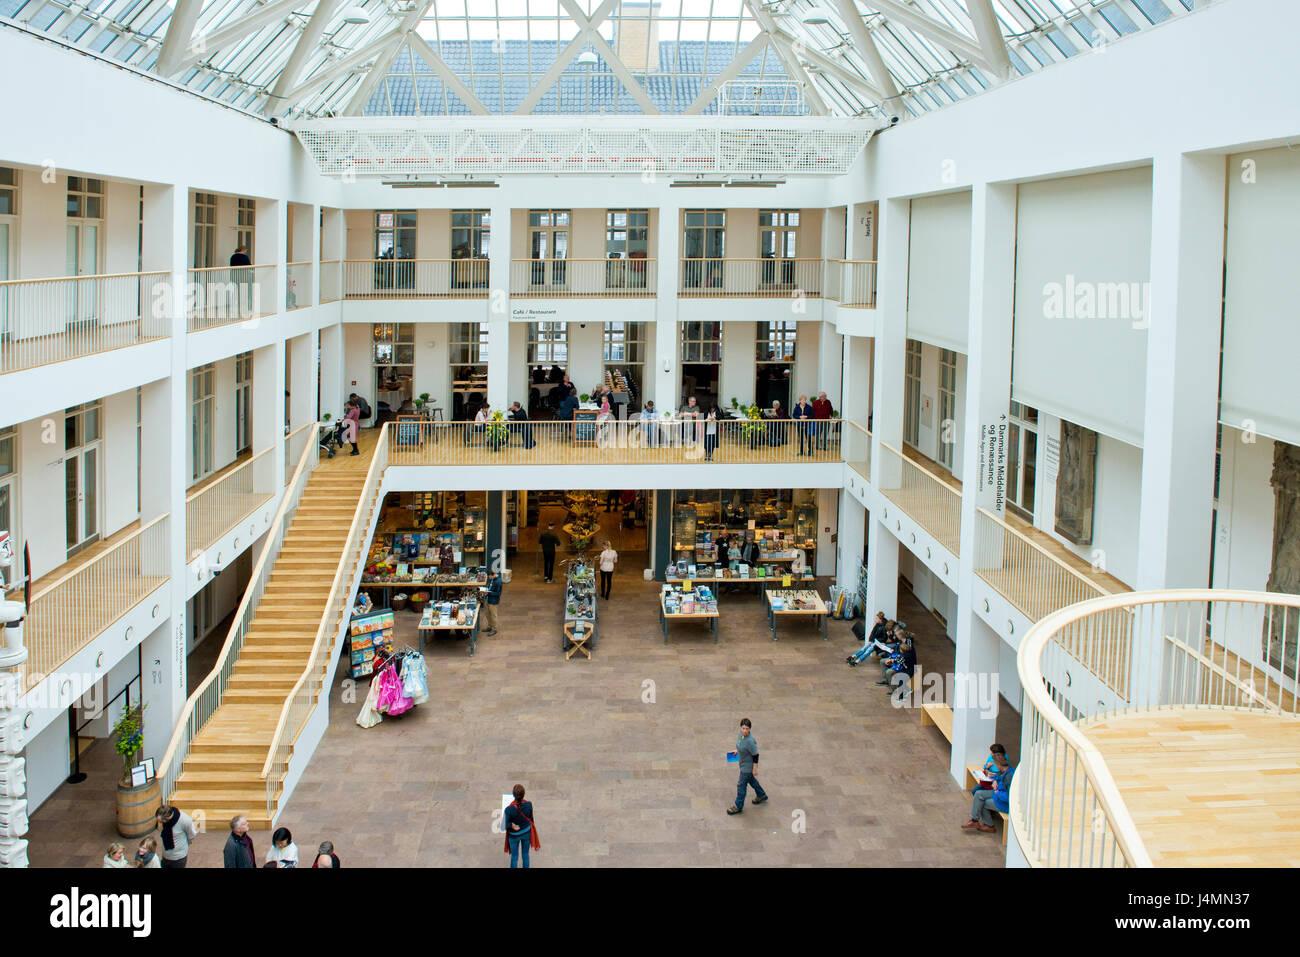 Musée national du Danemark, copenhague, Danemark Banque D'Images